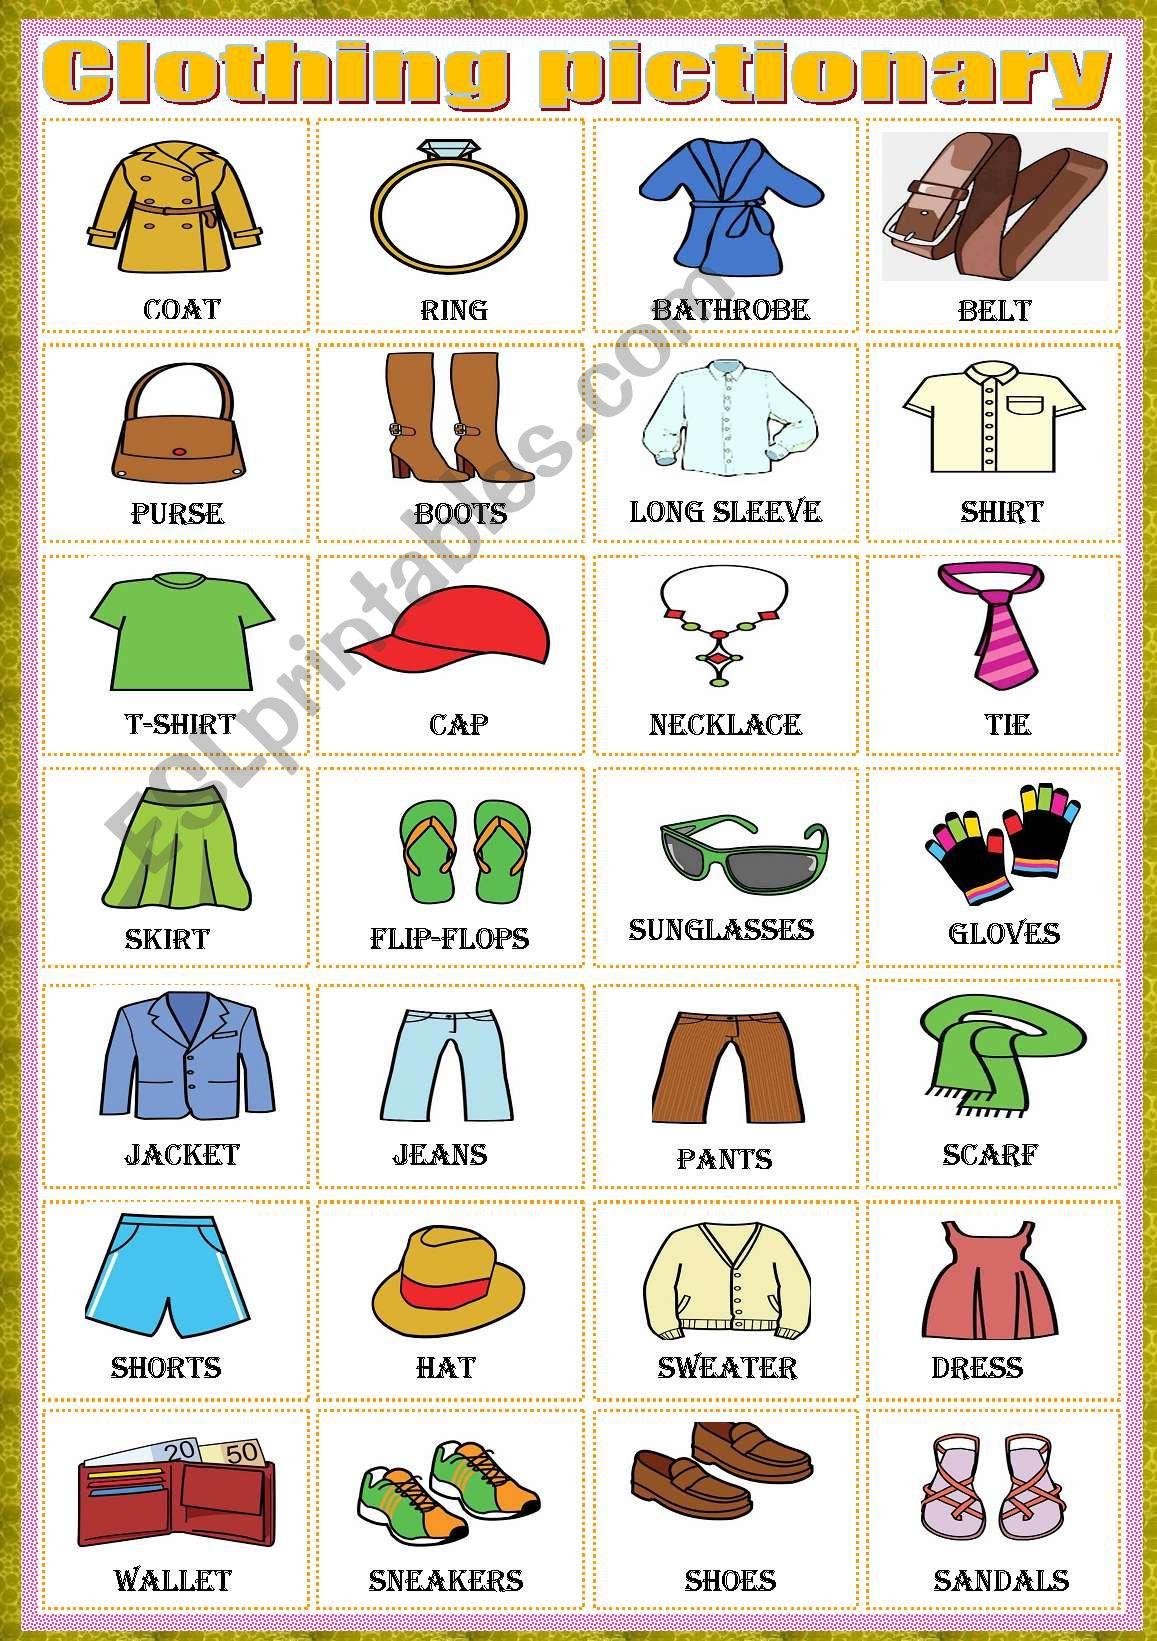 Clothing Pictionary